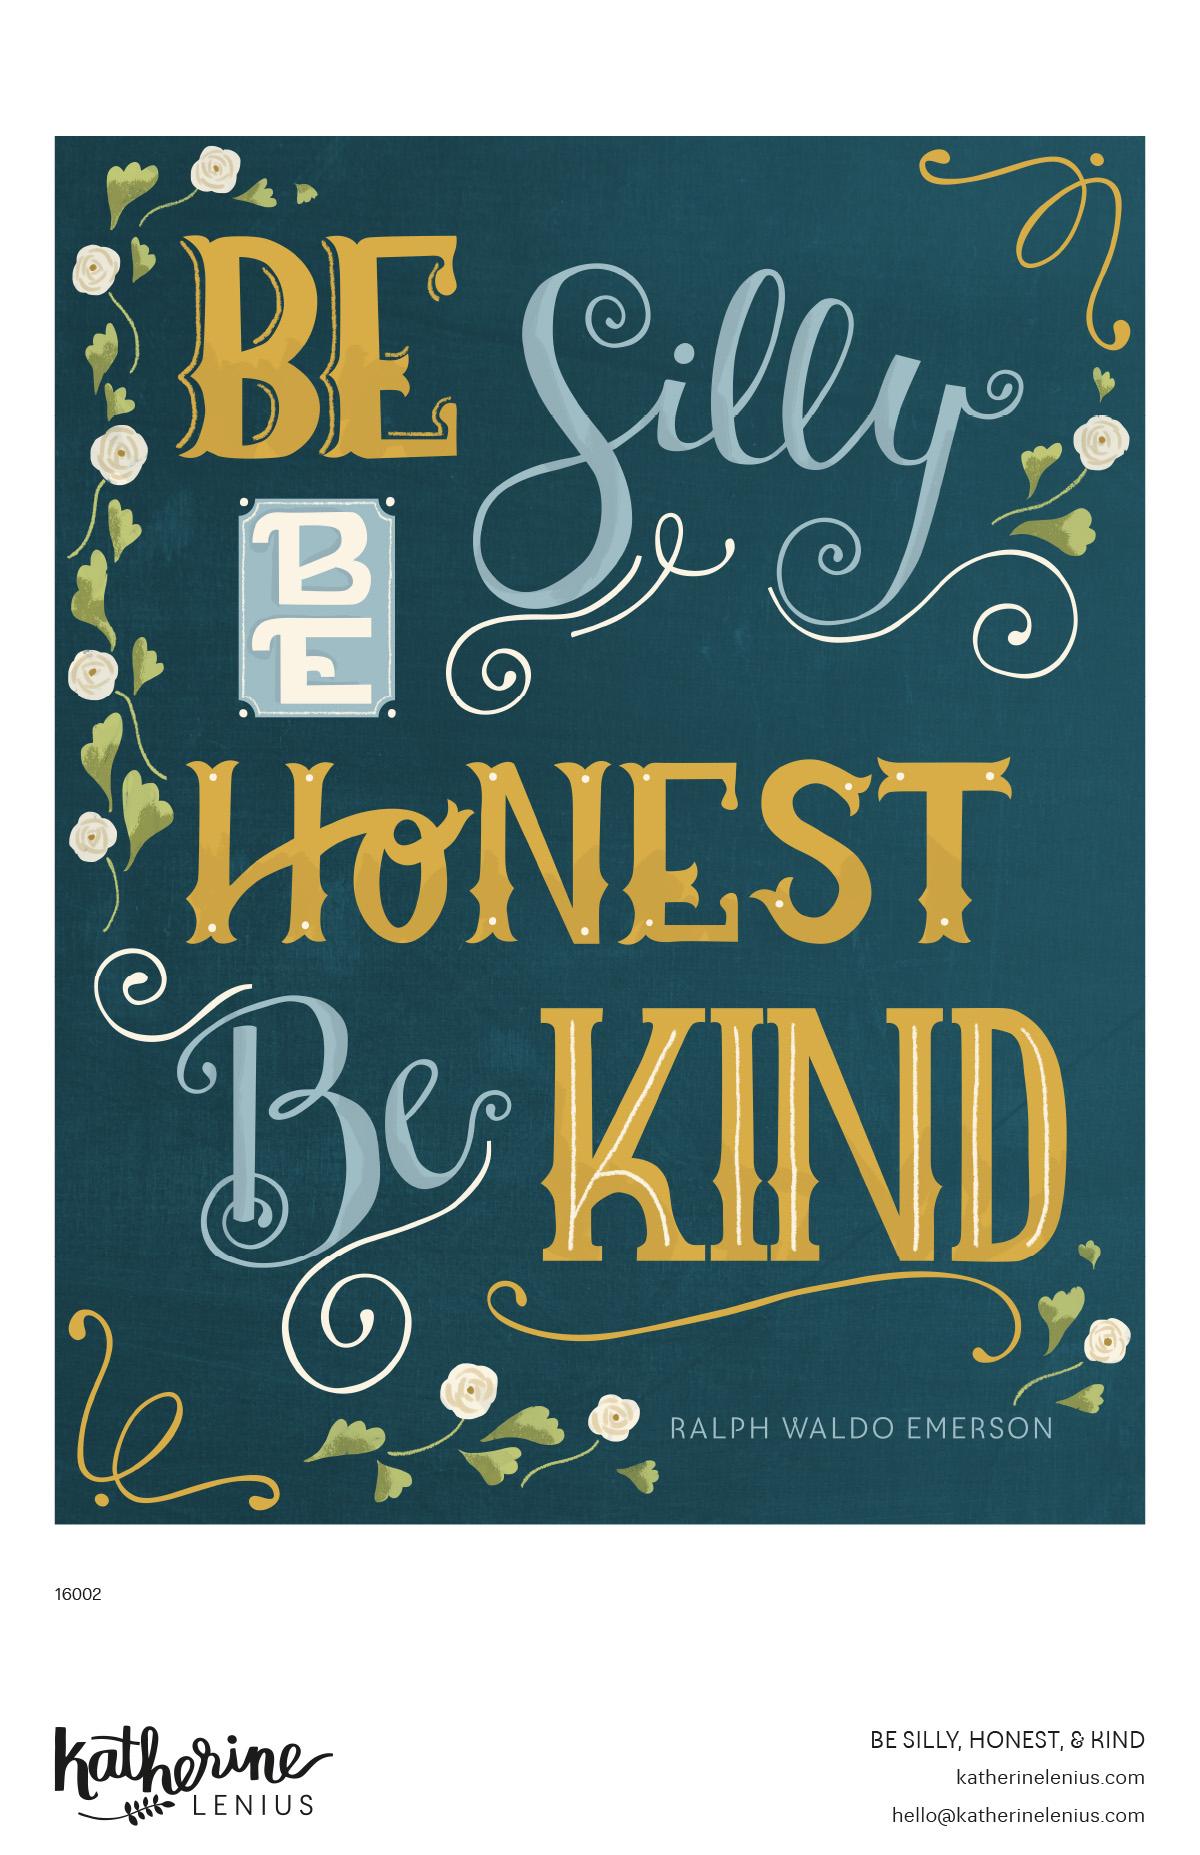 KL_16002_Be Silly Honest Kind copy.jpg